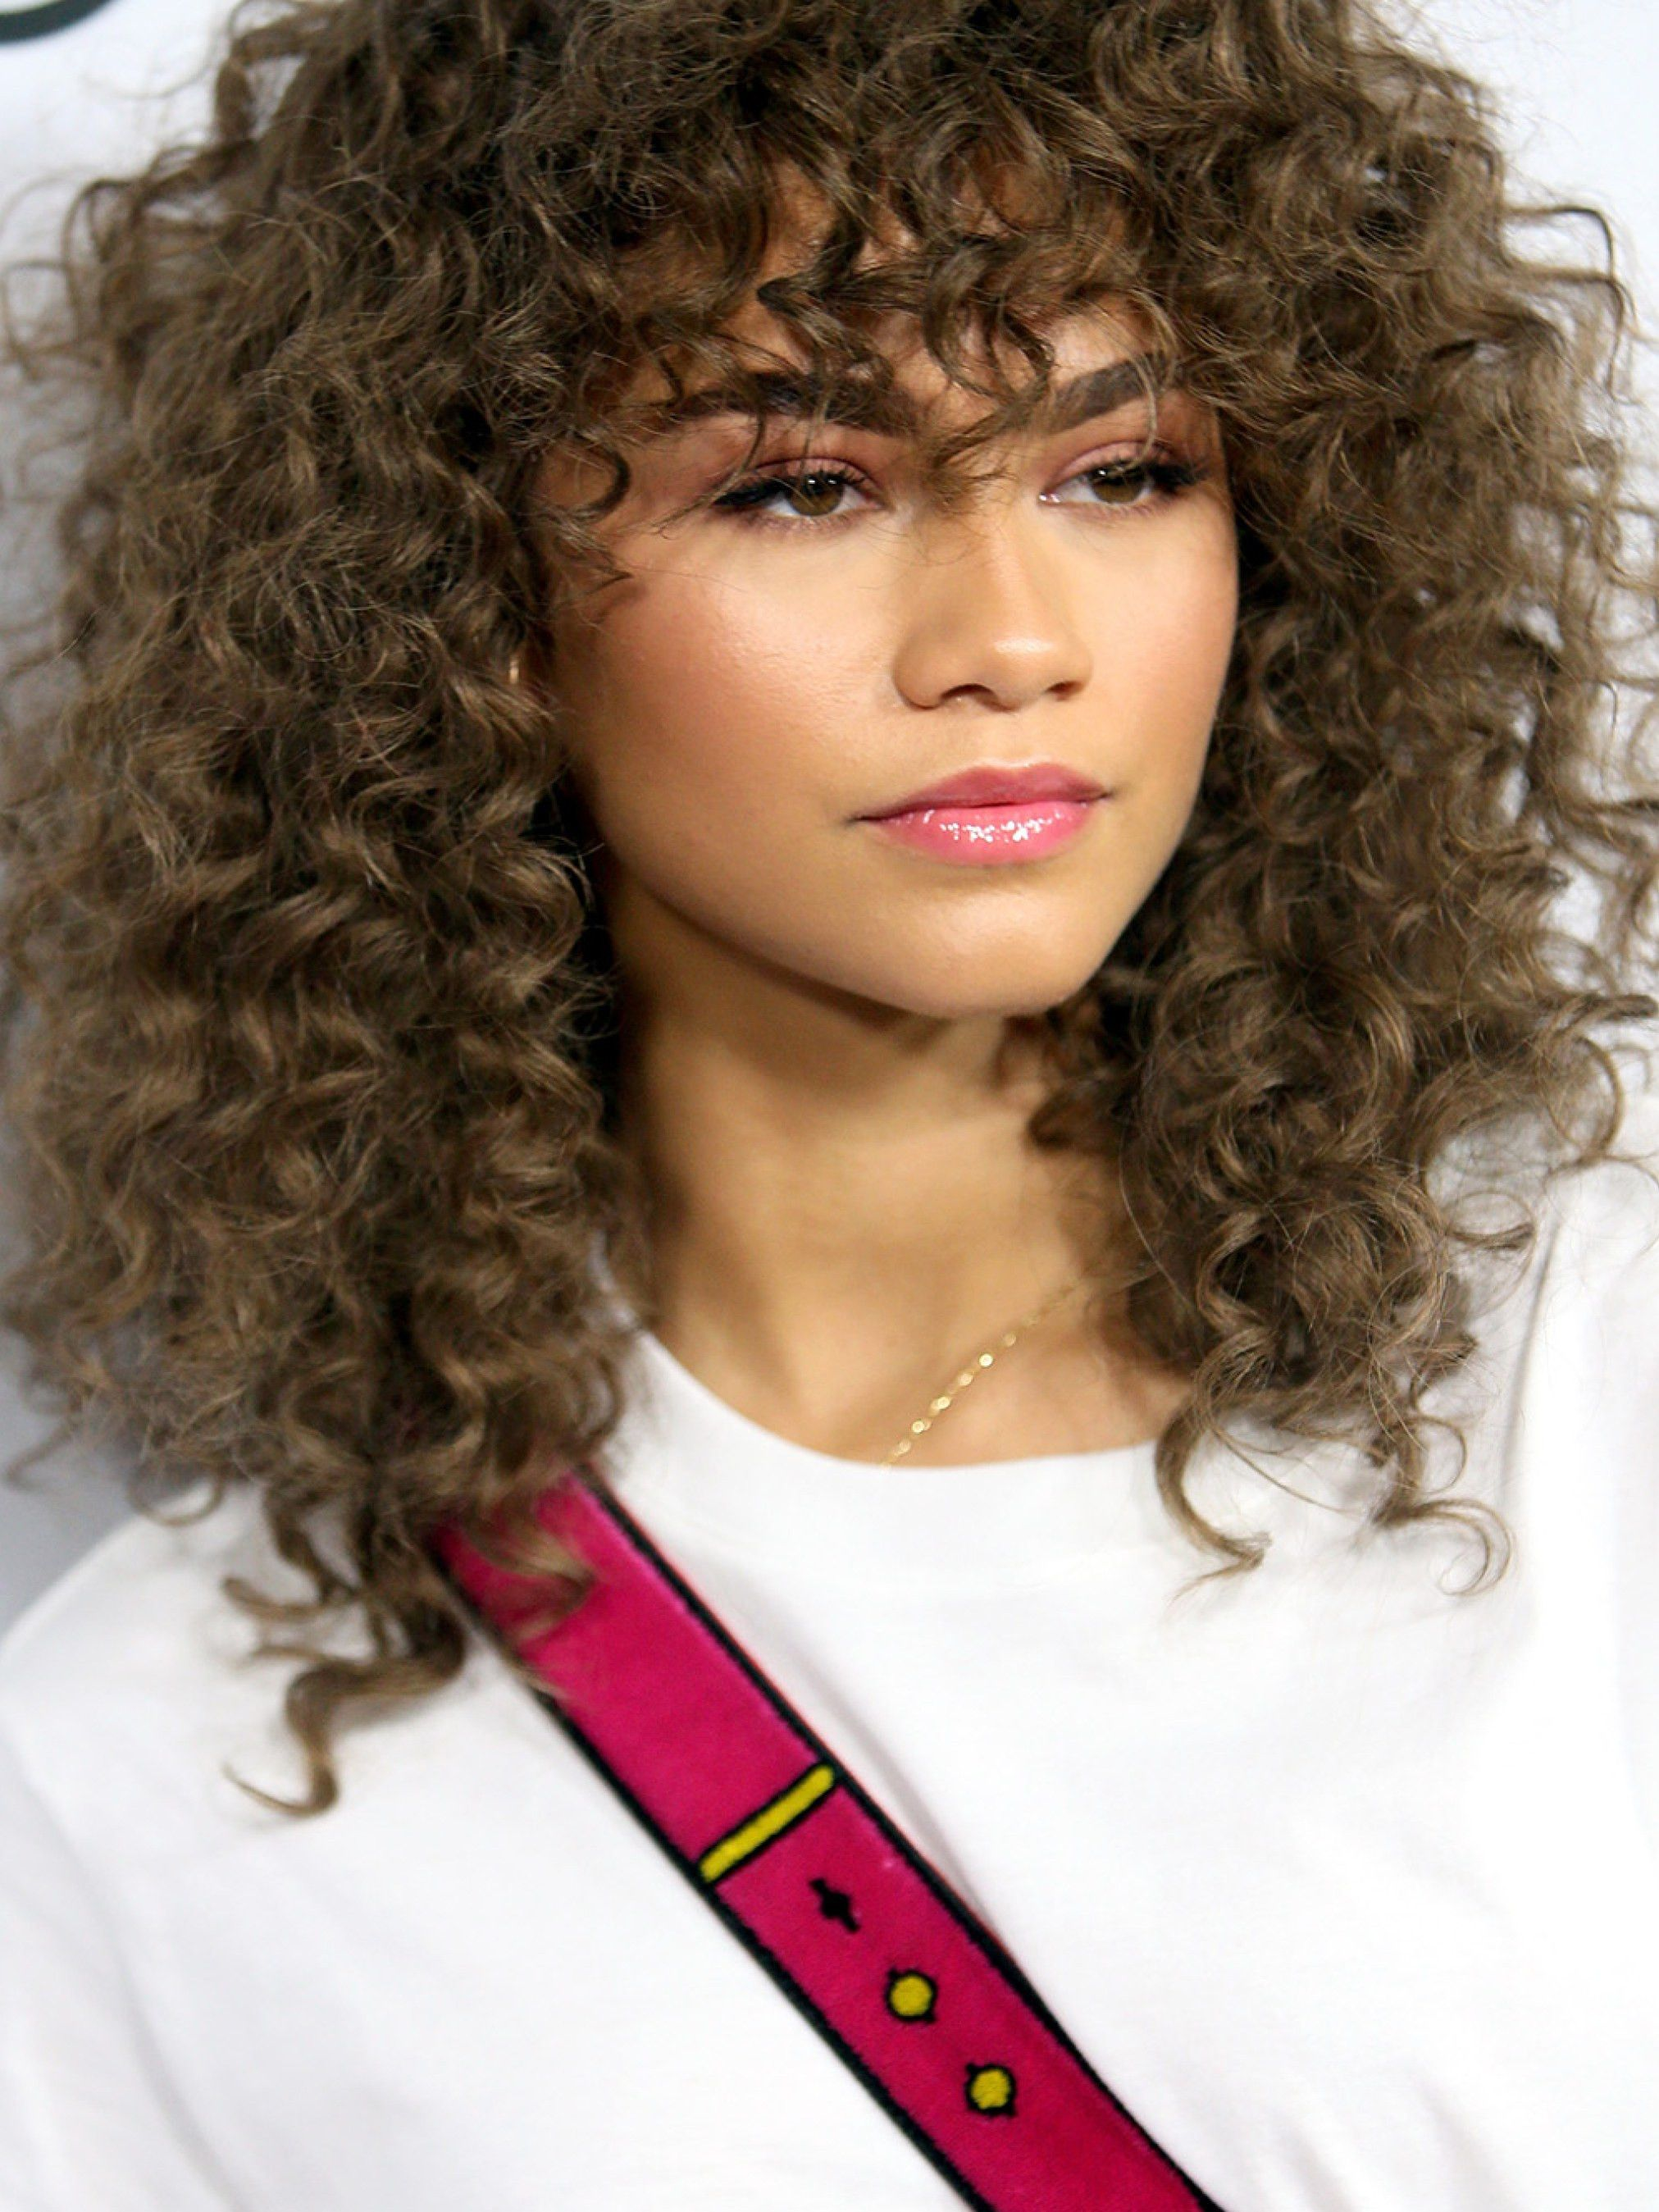 31 Easy Hairstyles For Medium Length Curly Hair For School Curly Hair Styles Easy Medium Hair Styles Easy Hairstyles For Medium Hair